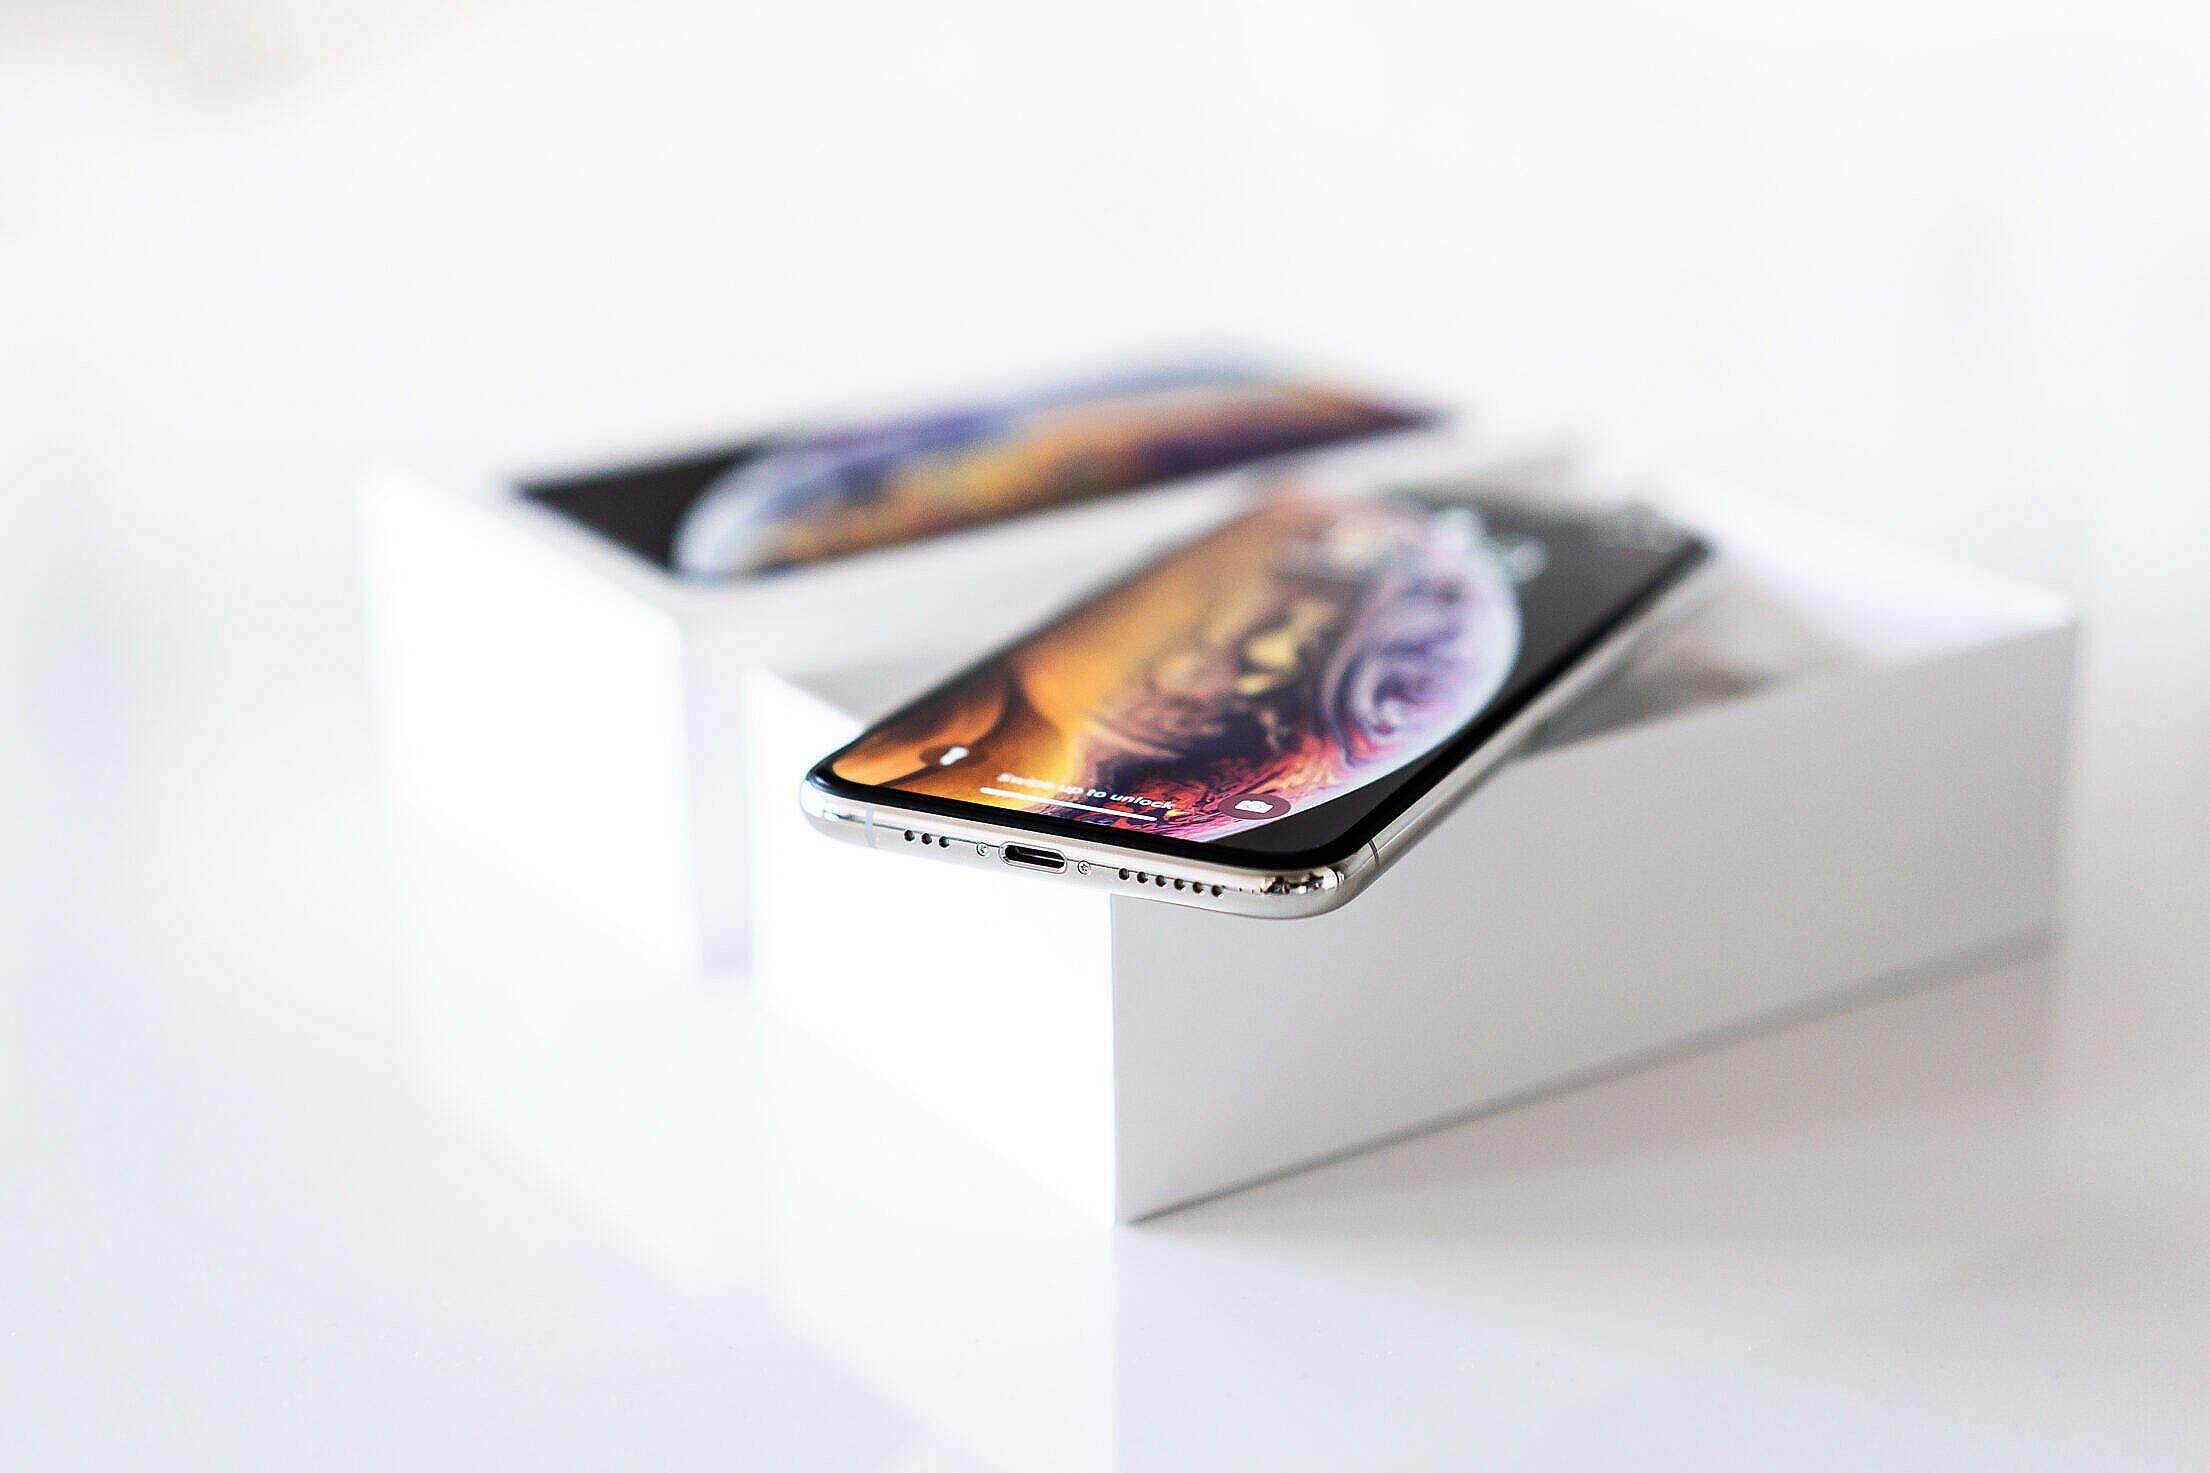 Brand New iPhone XS Free Stock Photo